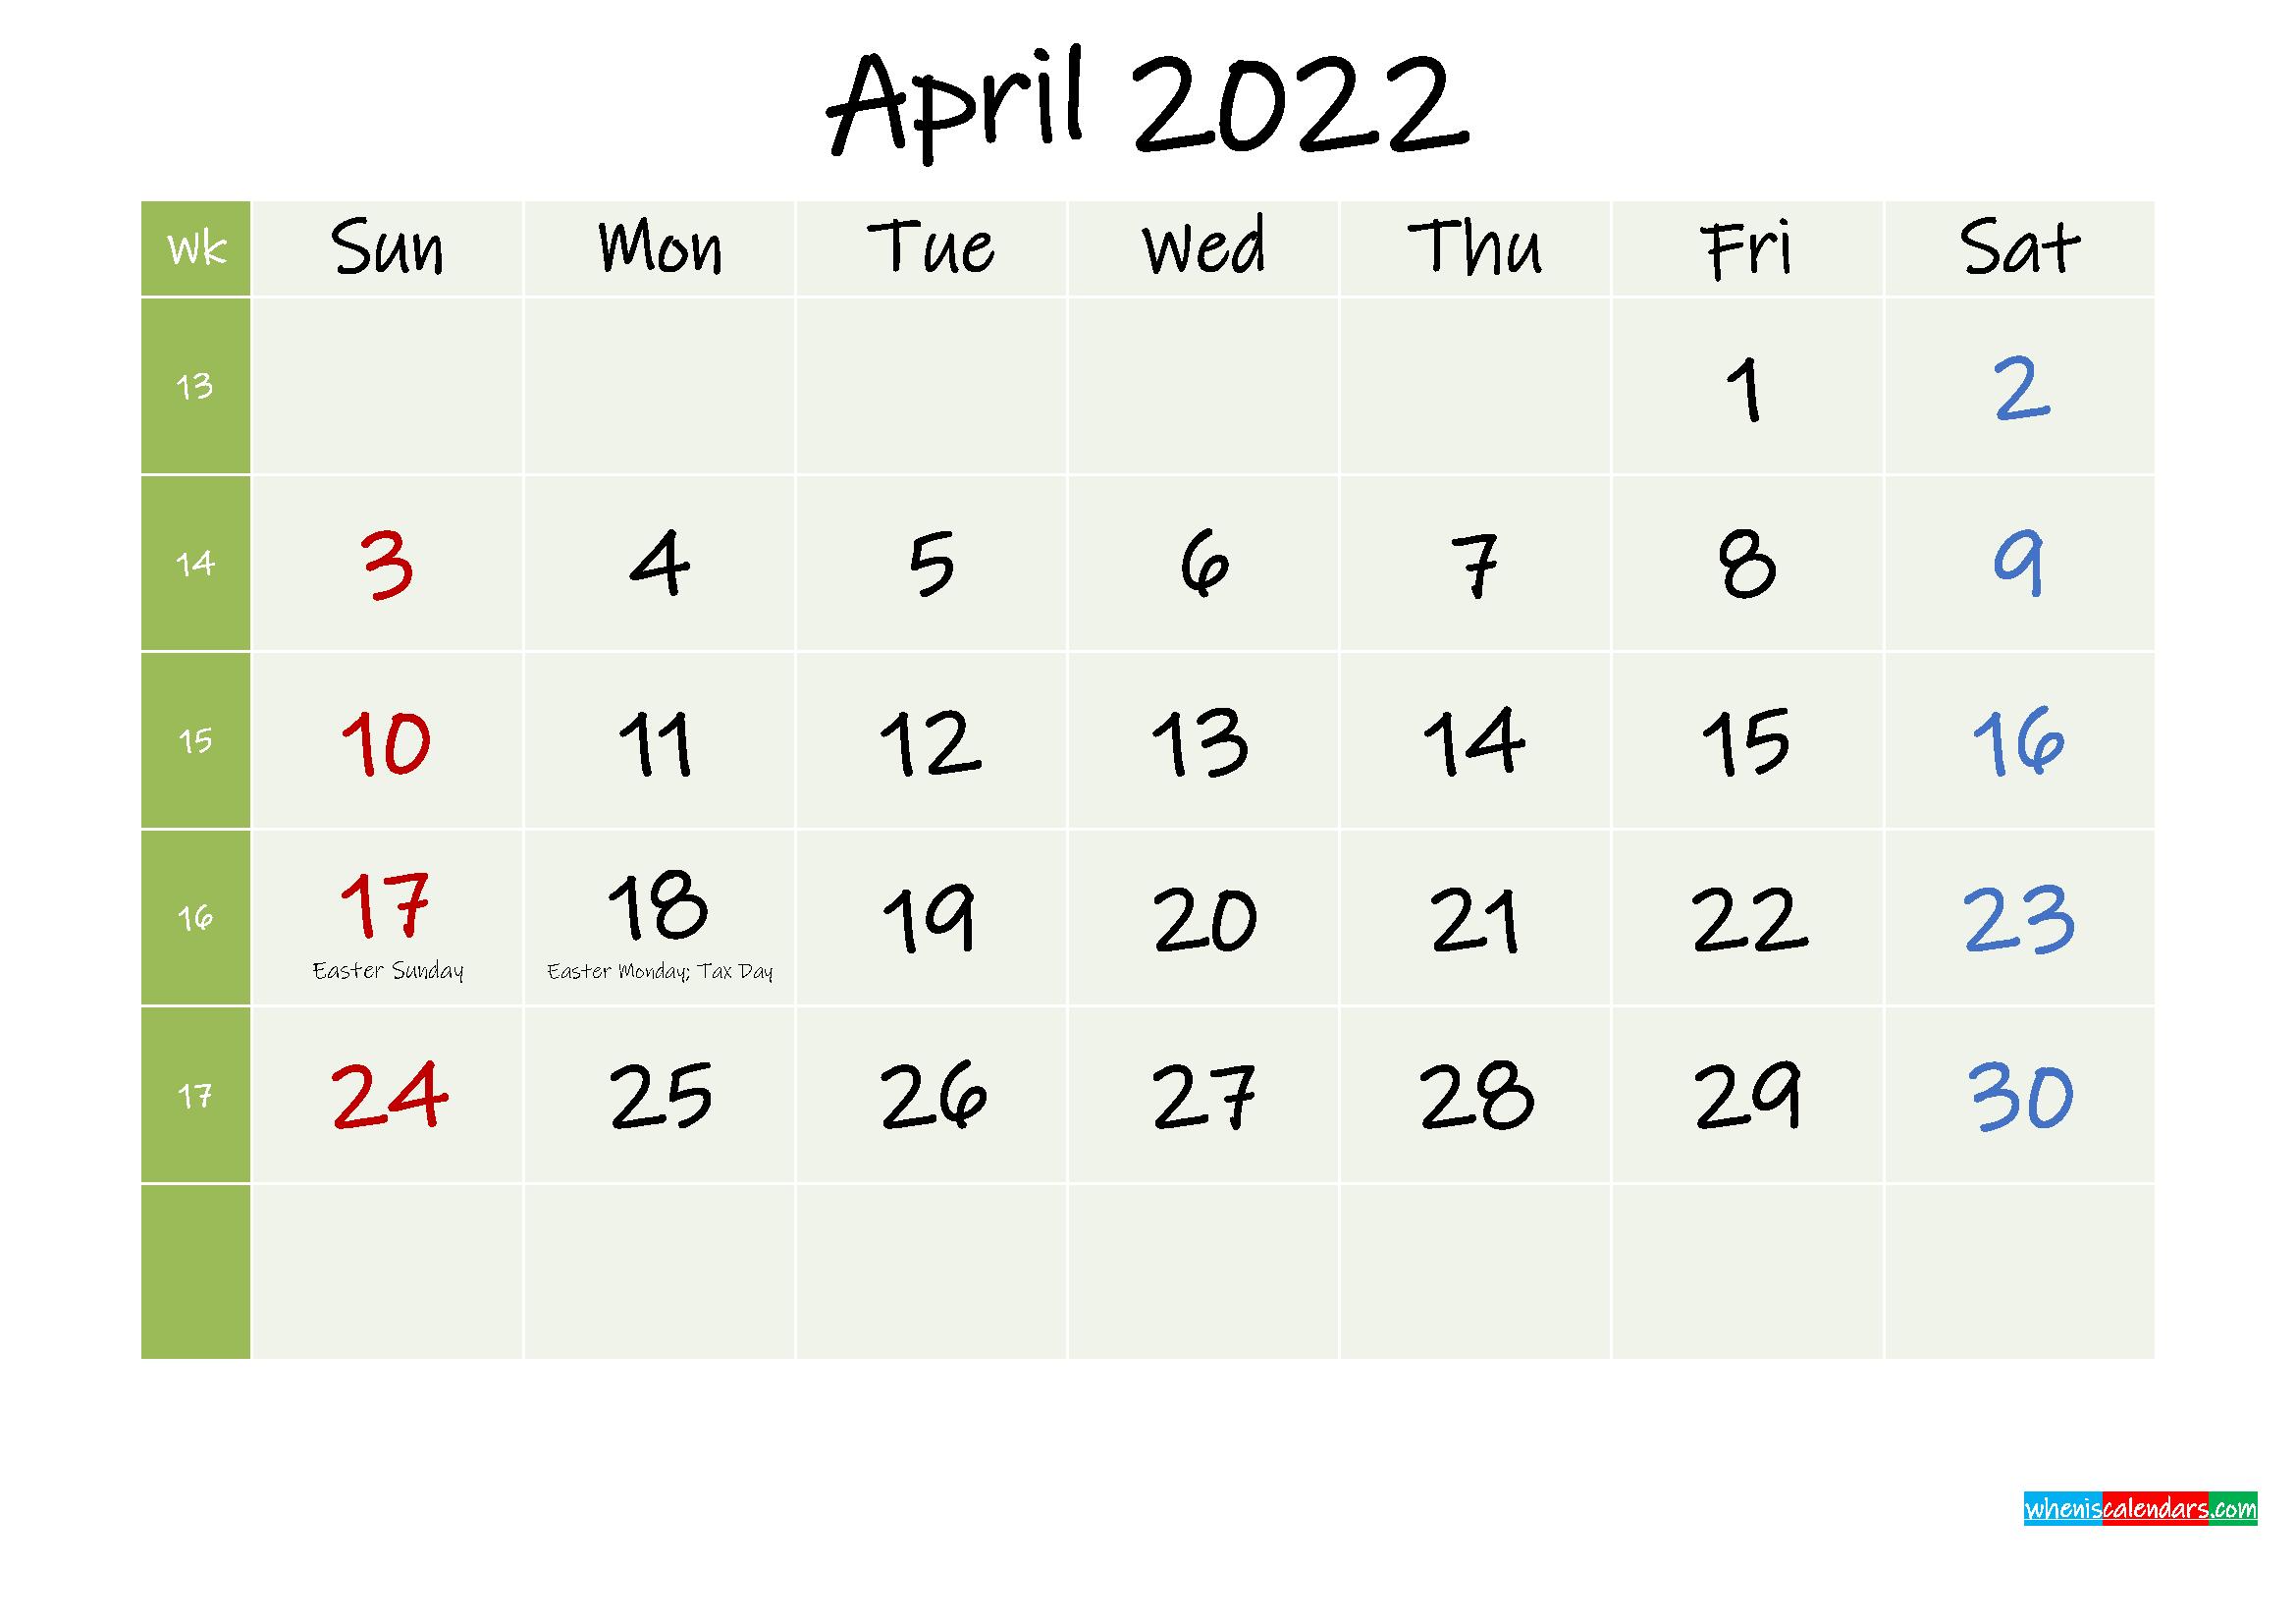 April 2022 Calendar with Holidays Printable